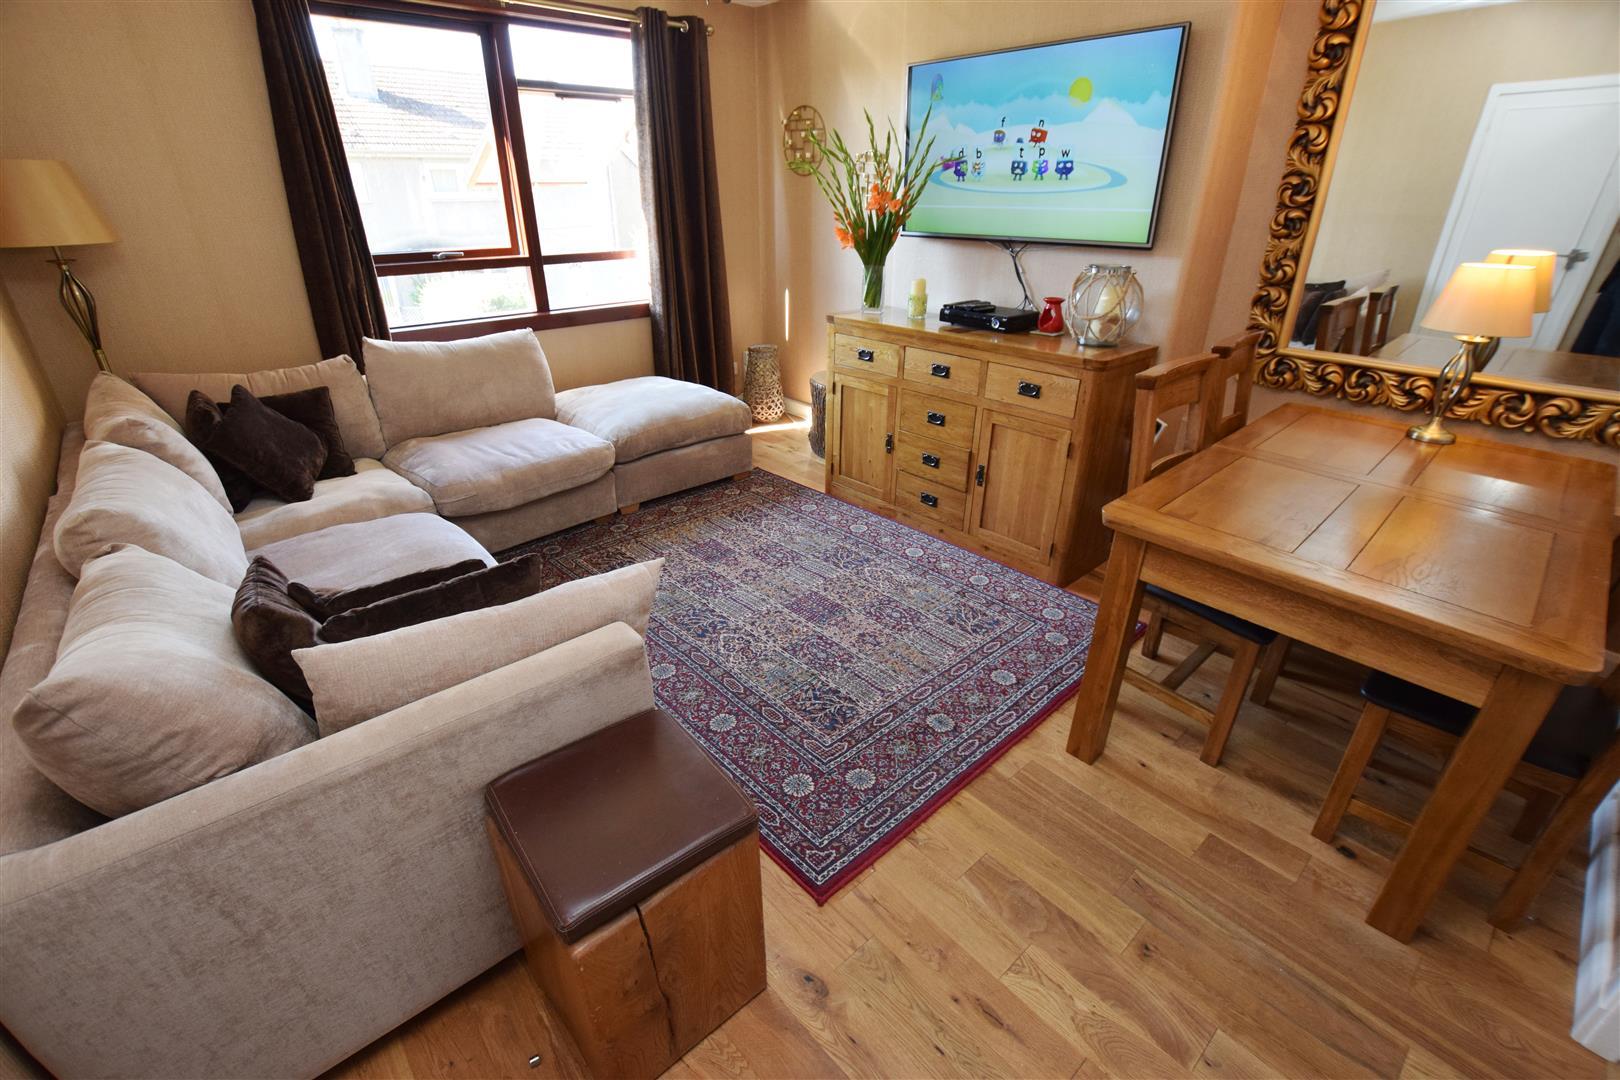 39, Cluny Terrace, Perthshire, PH1 2HW, UK